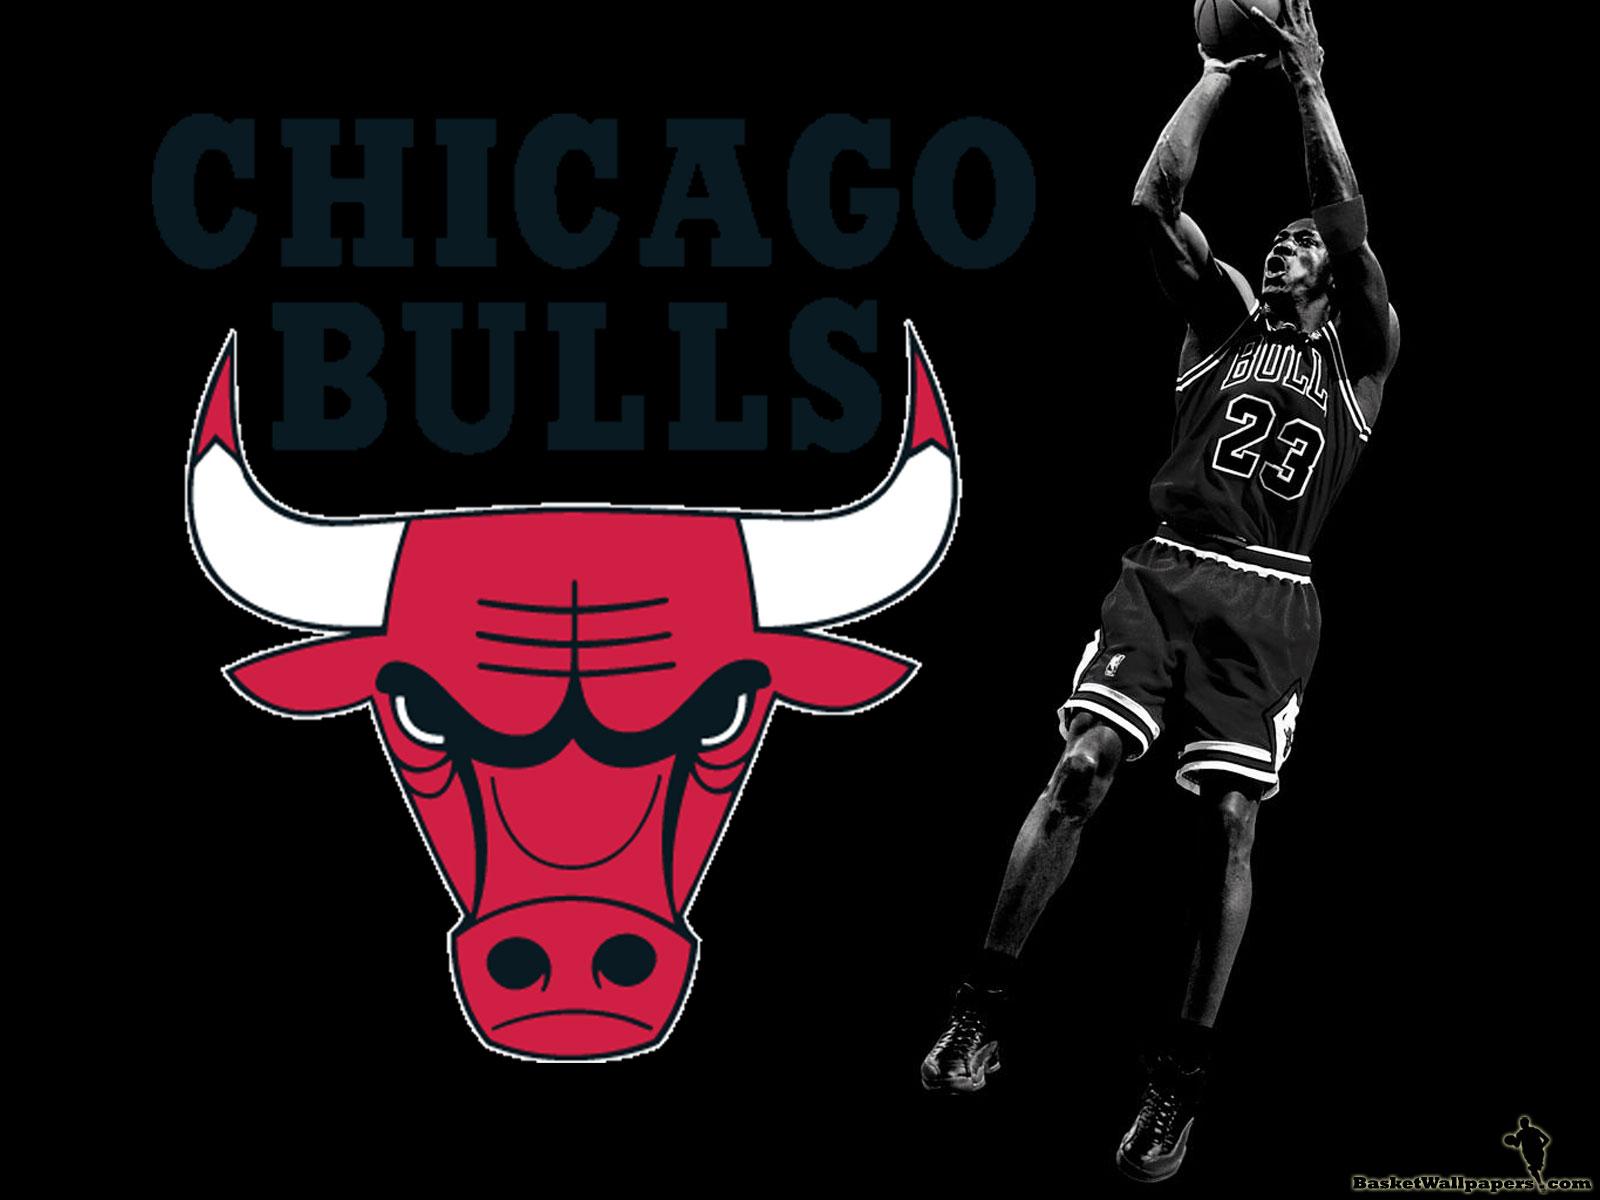 http://3.bp.blogspot.com/-KNeimy1aagM/Ta77IBqyMaI/AAAAAAAAEE8/uC4JZRwa298/s1600/Michael-Jordan-Chicago-Bulls-Wallpaper.jpg